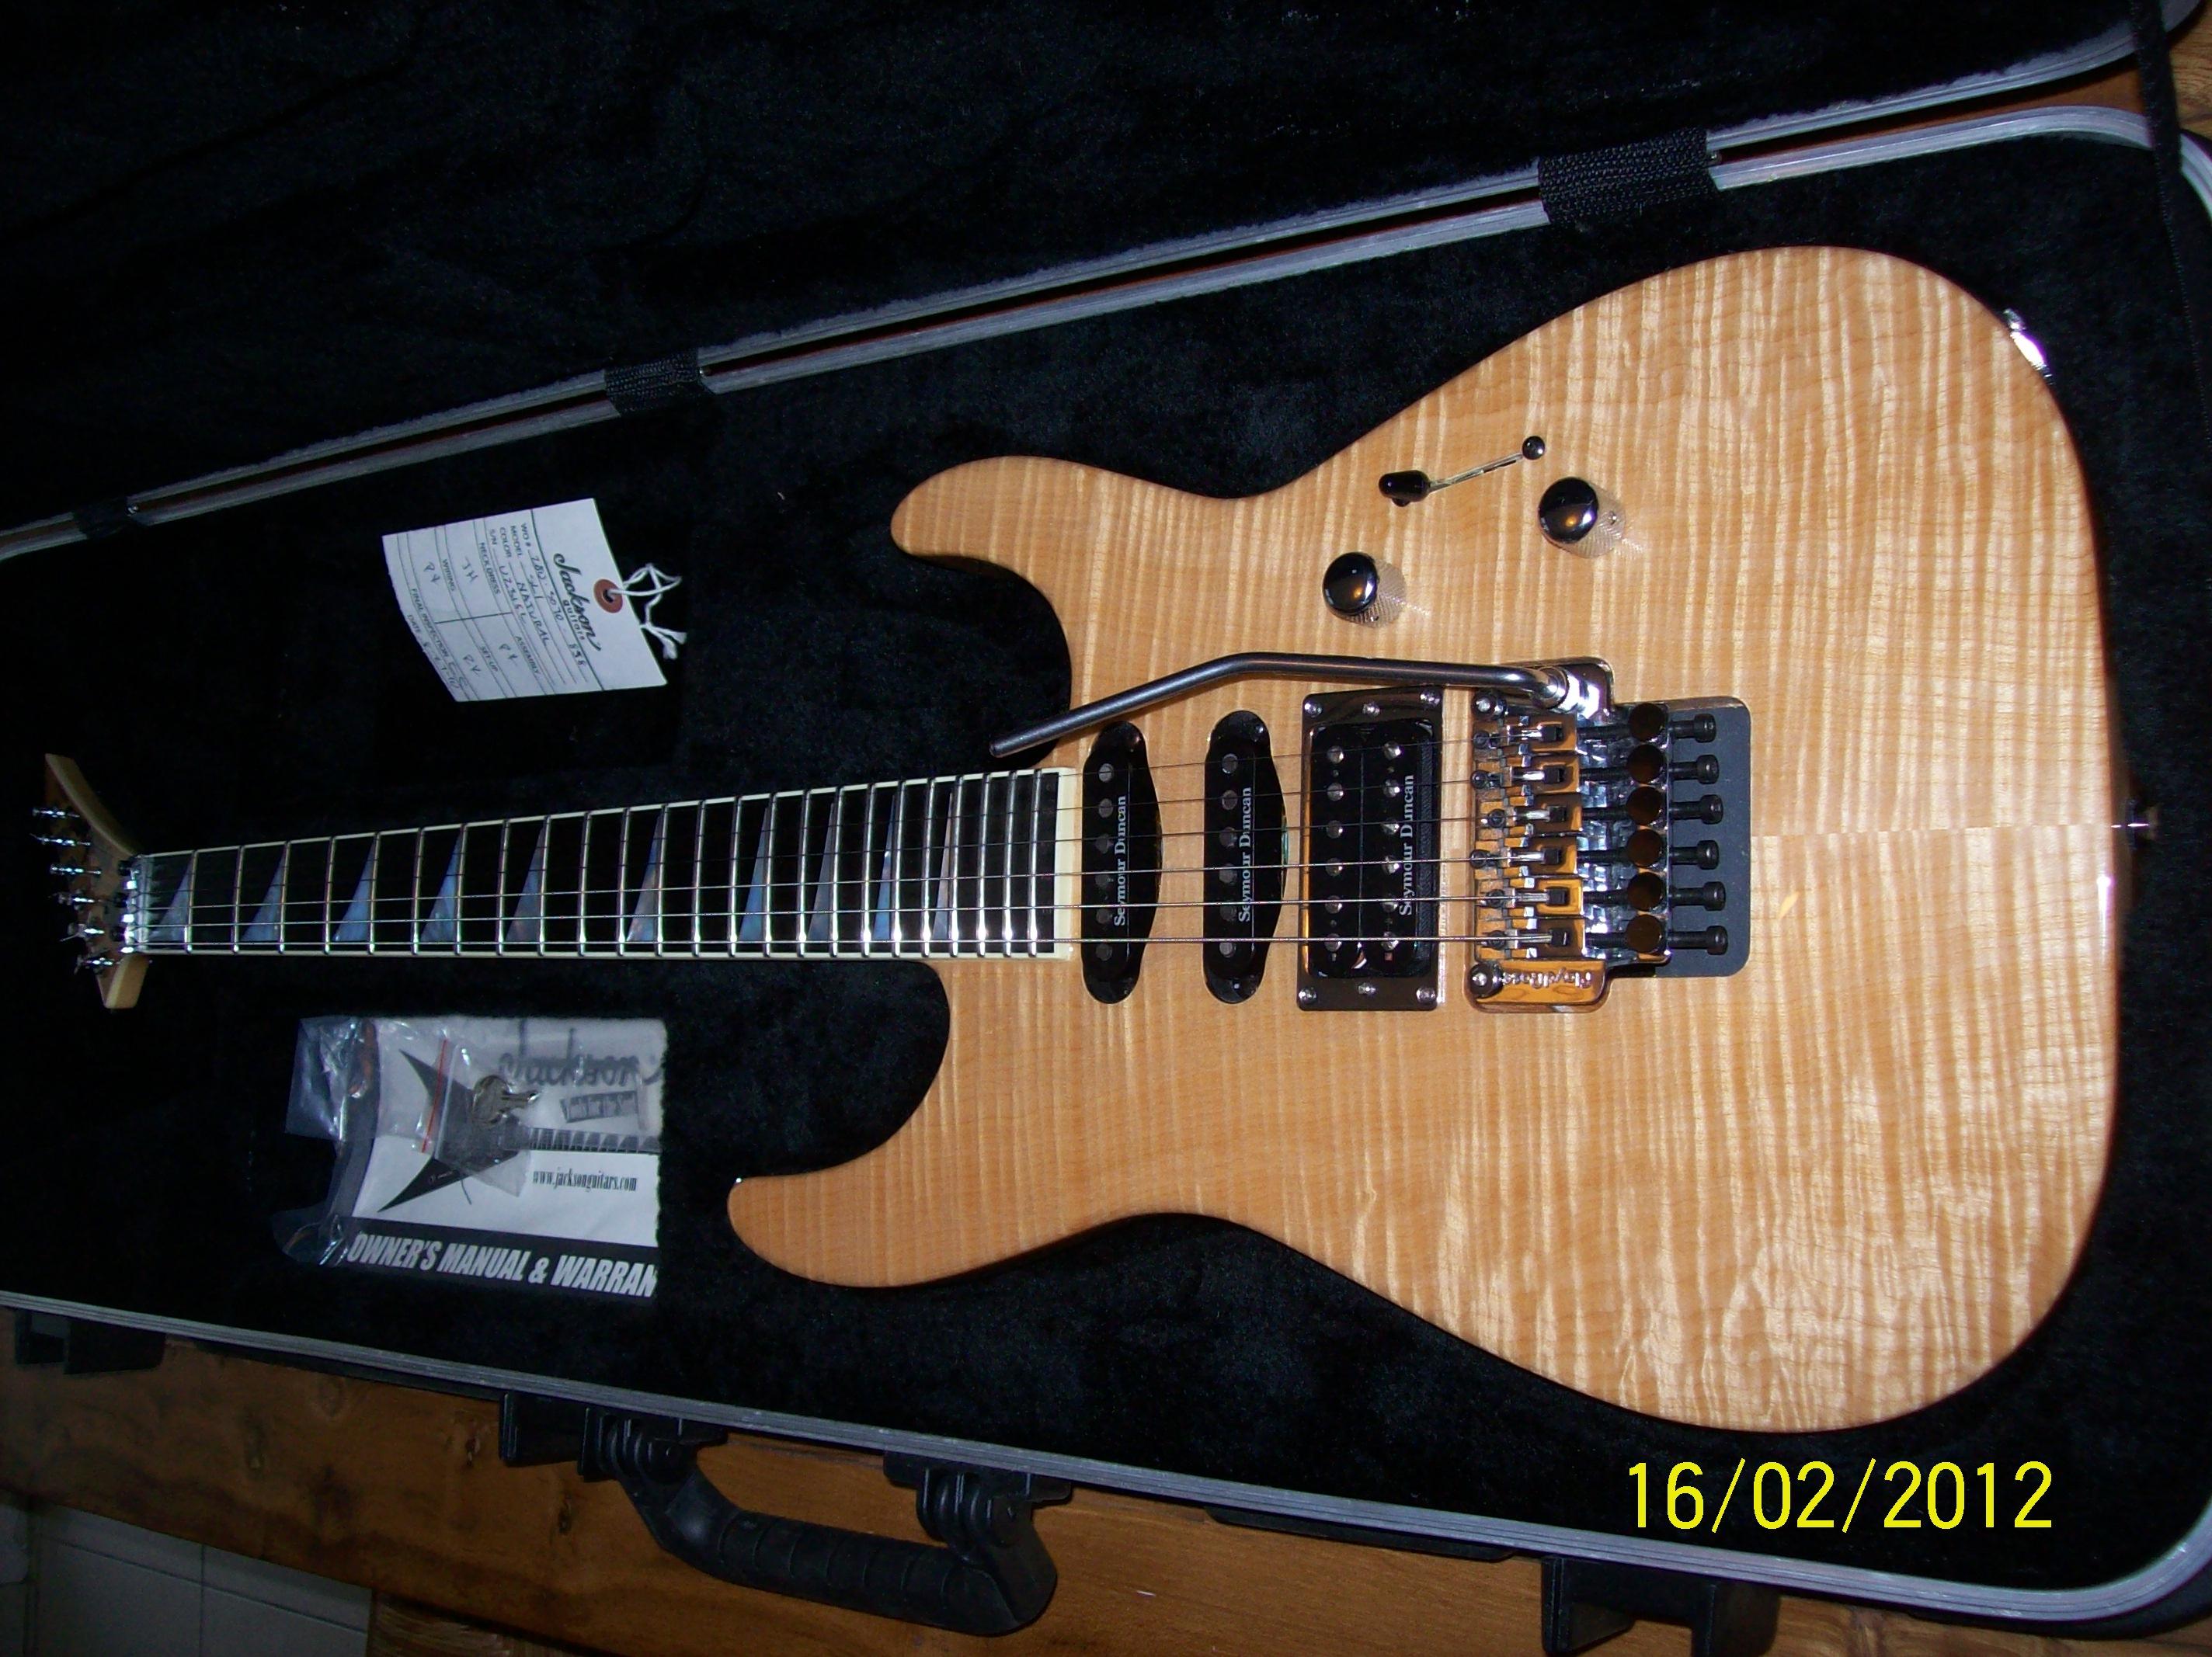 Jackson Ke3 Guitar Wiring Schematics Trusted Diagrams Soloist Diagram Sl1 Circuit Connection U2022 Bass